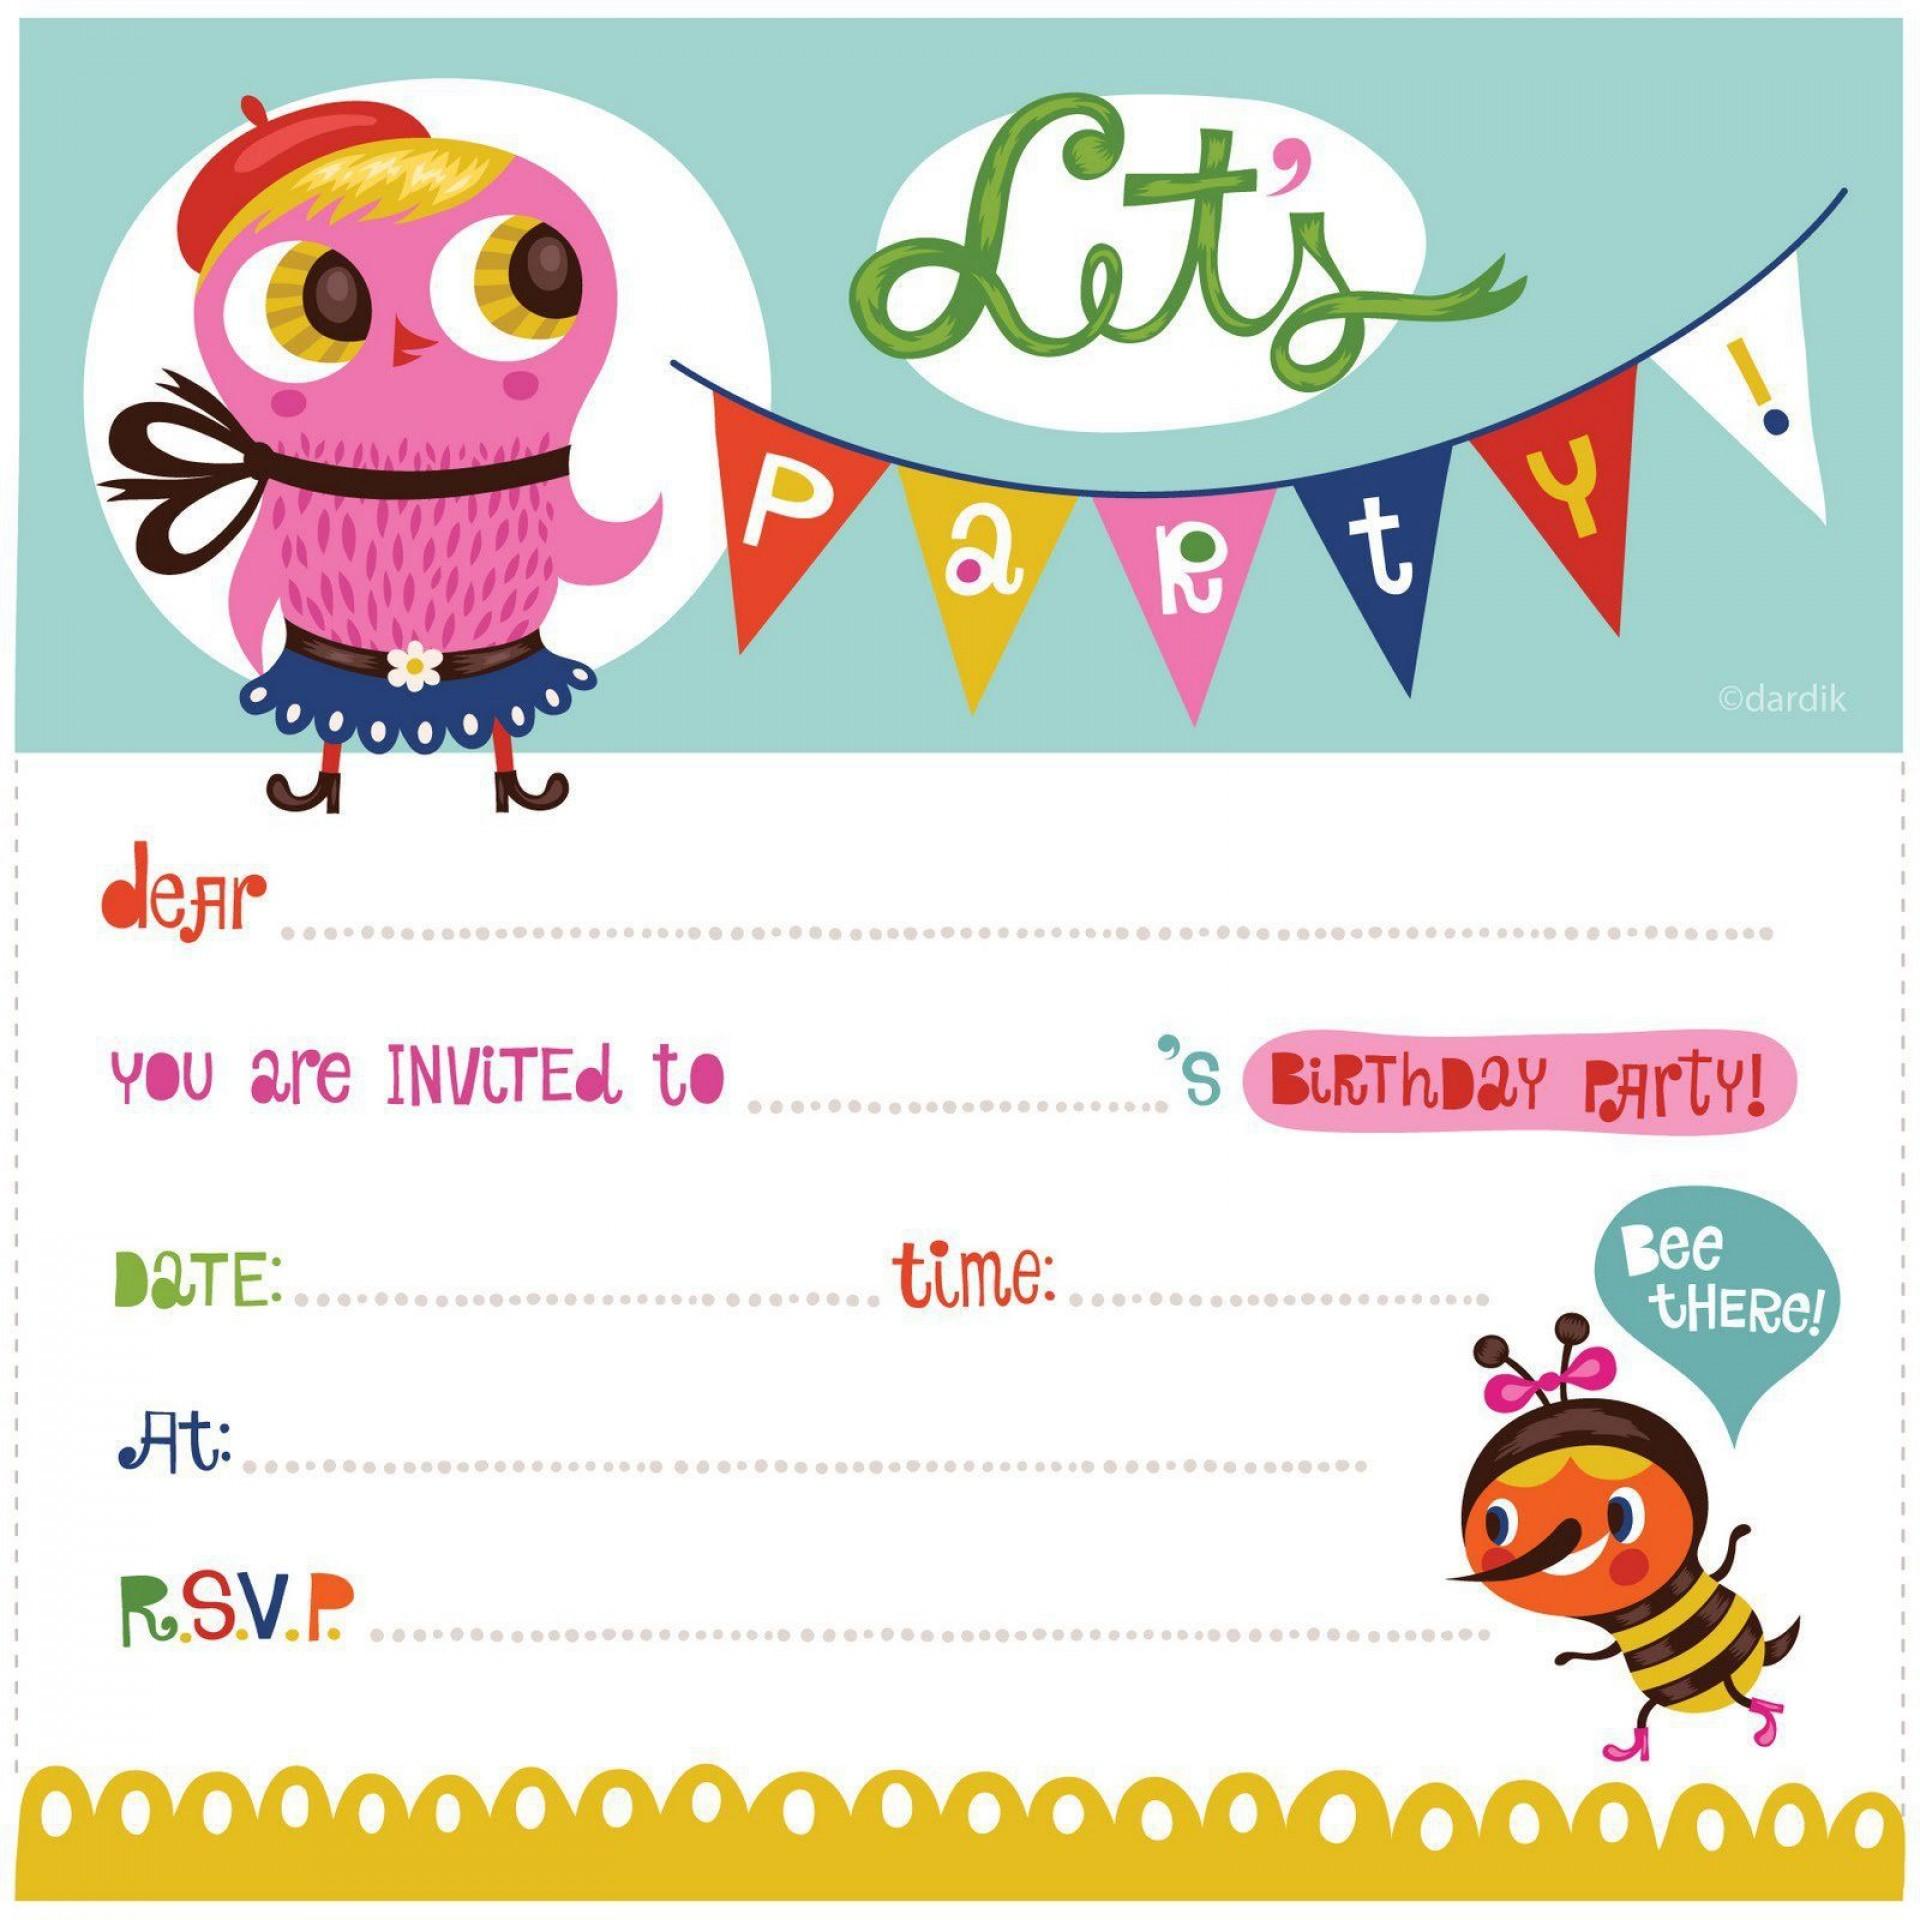 004 Stirring Free Online Birthday Party Invitation Template Design  Templates Maker1920